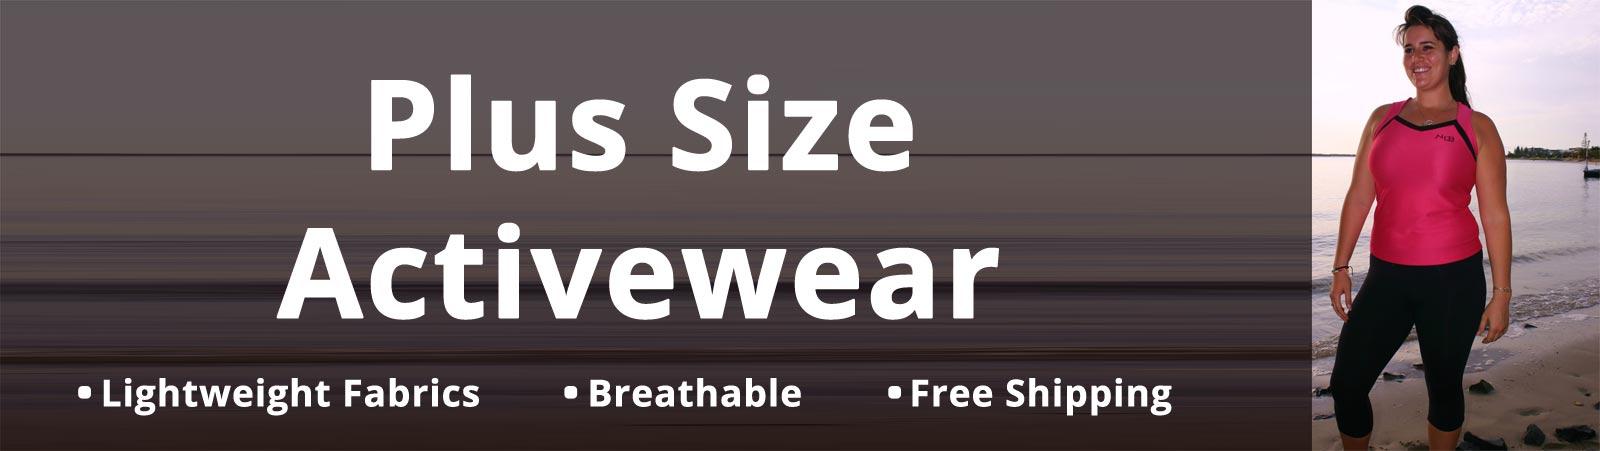 plus-size-activewear.jpg